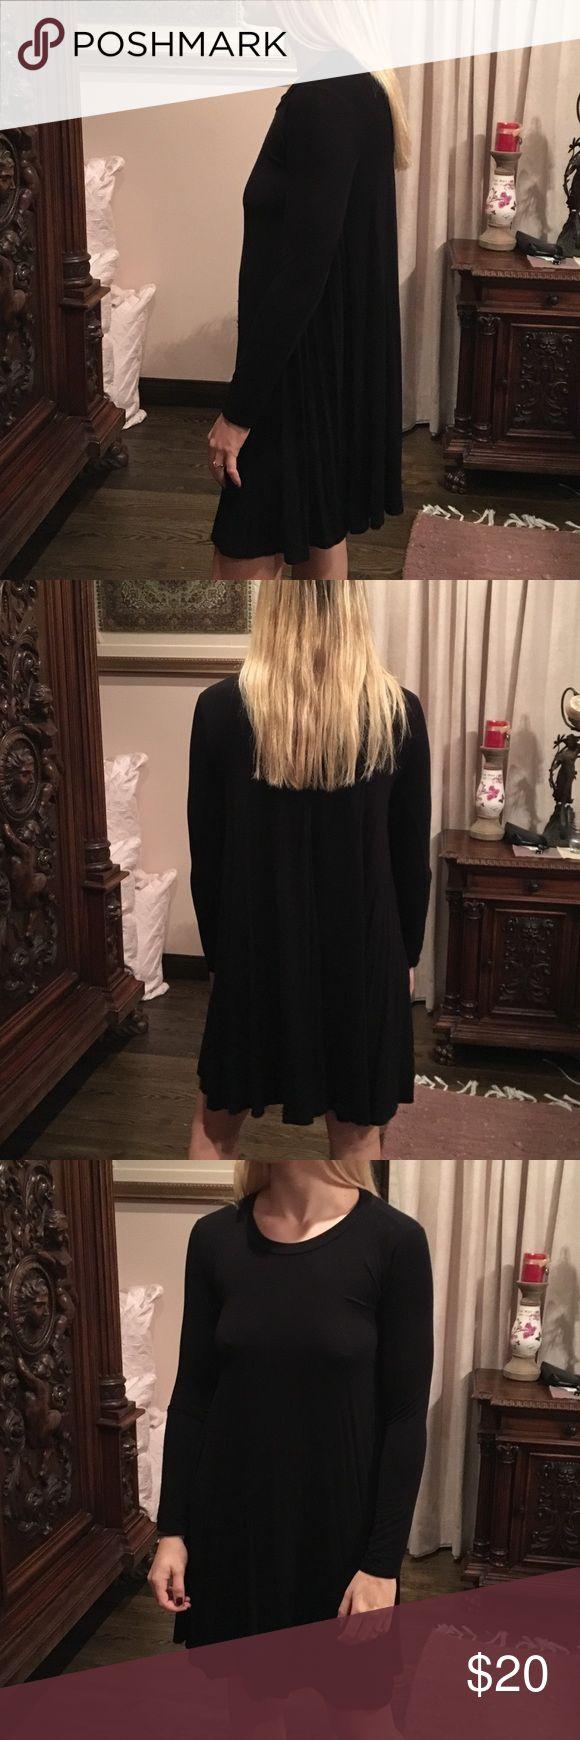 Ollie & Chloe Dress | Chloe dress, Dresses, Clothes design